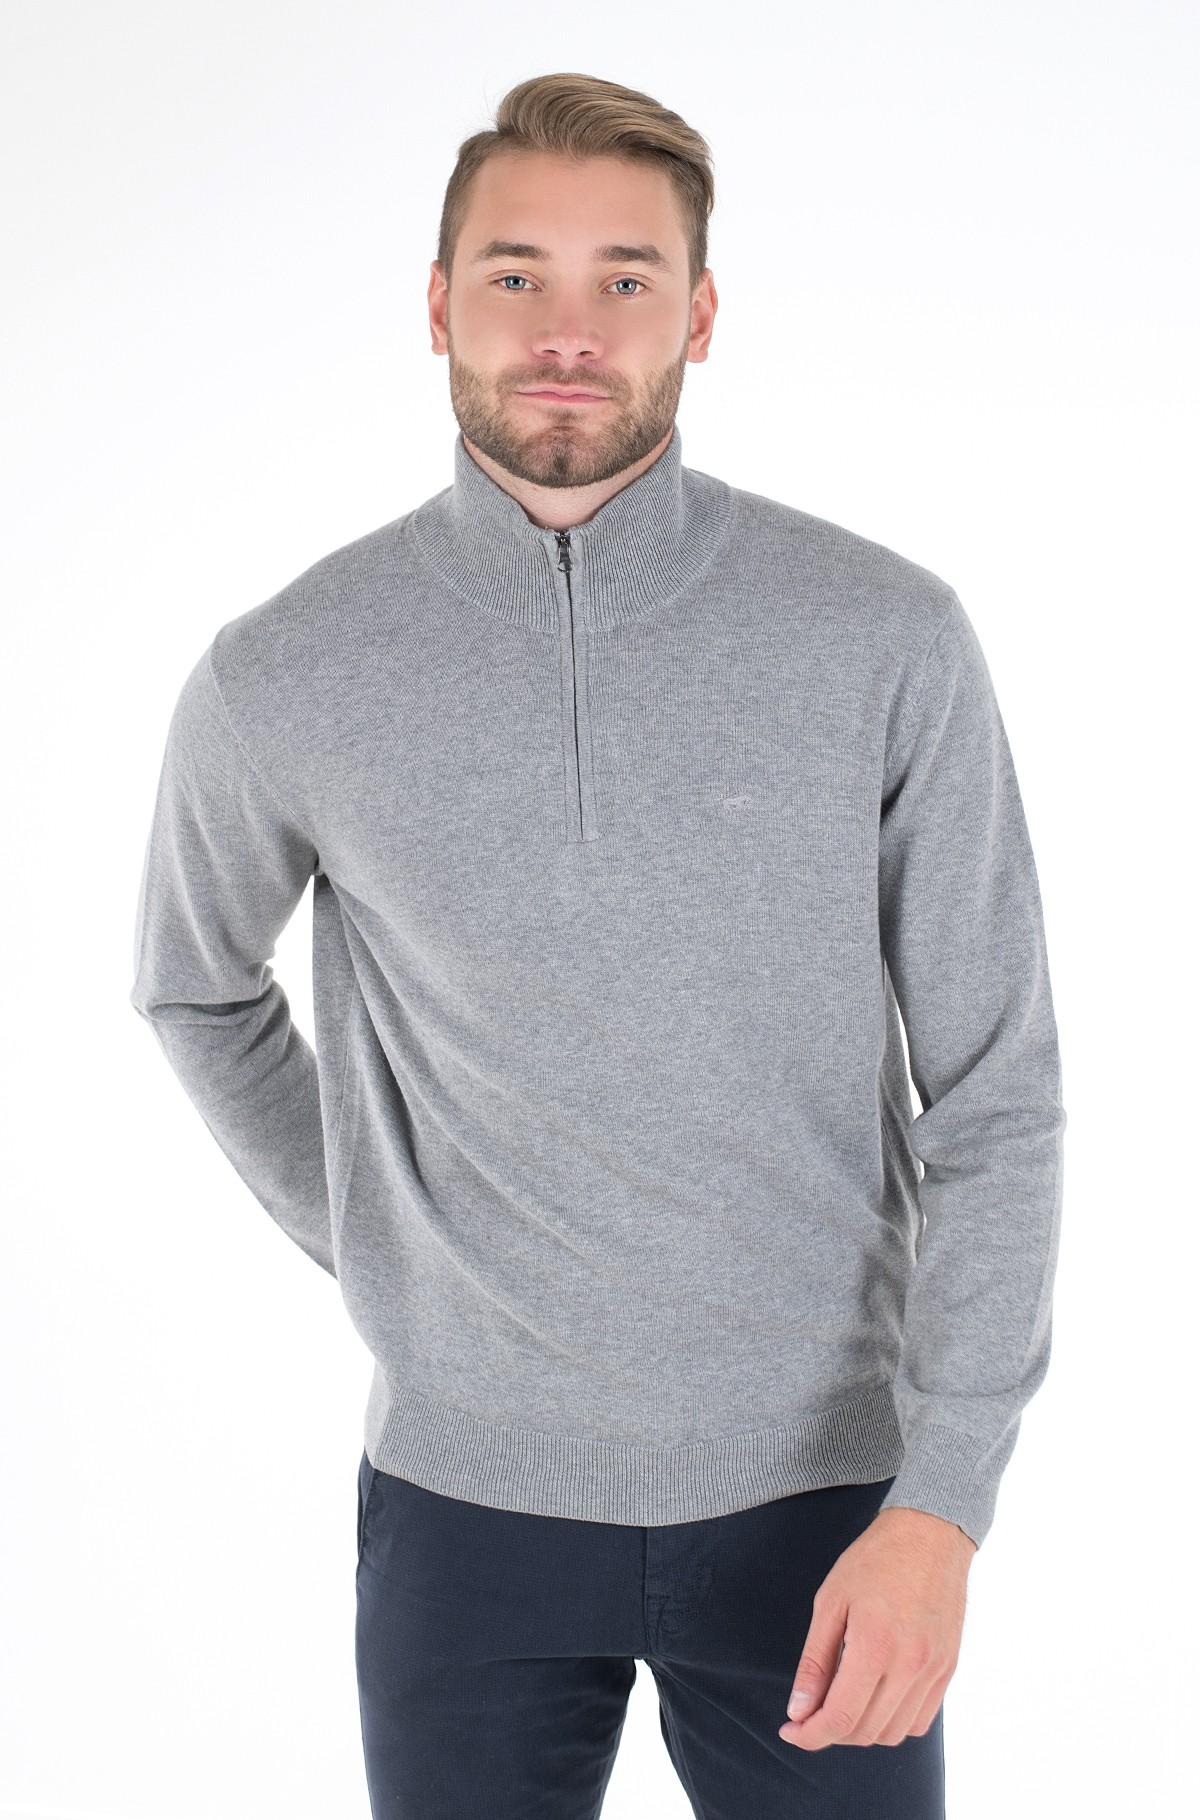 Sweater 101-0107-full-1